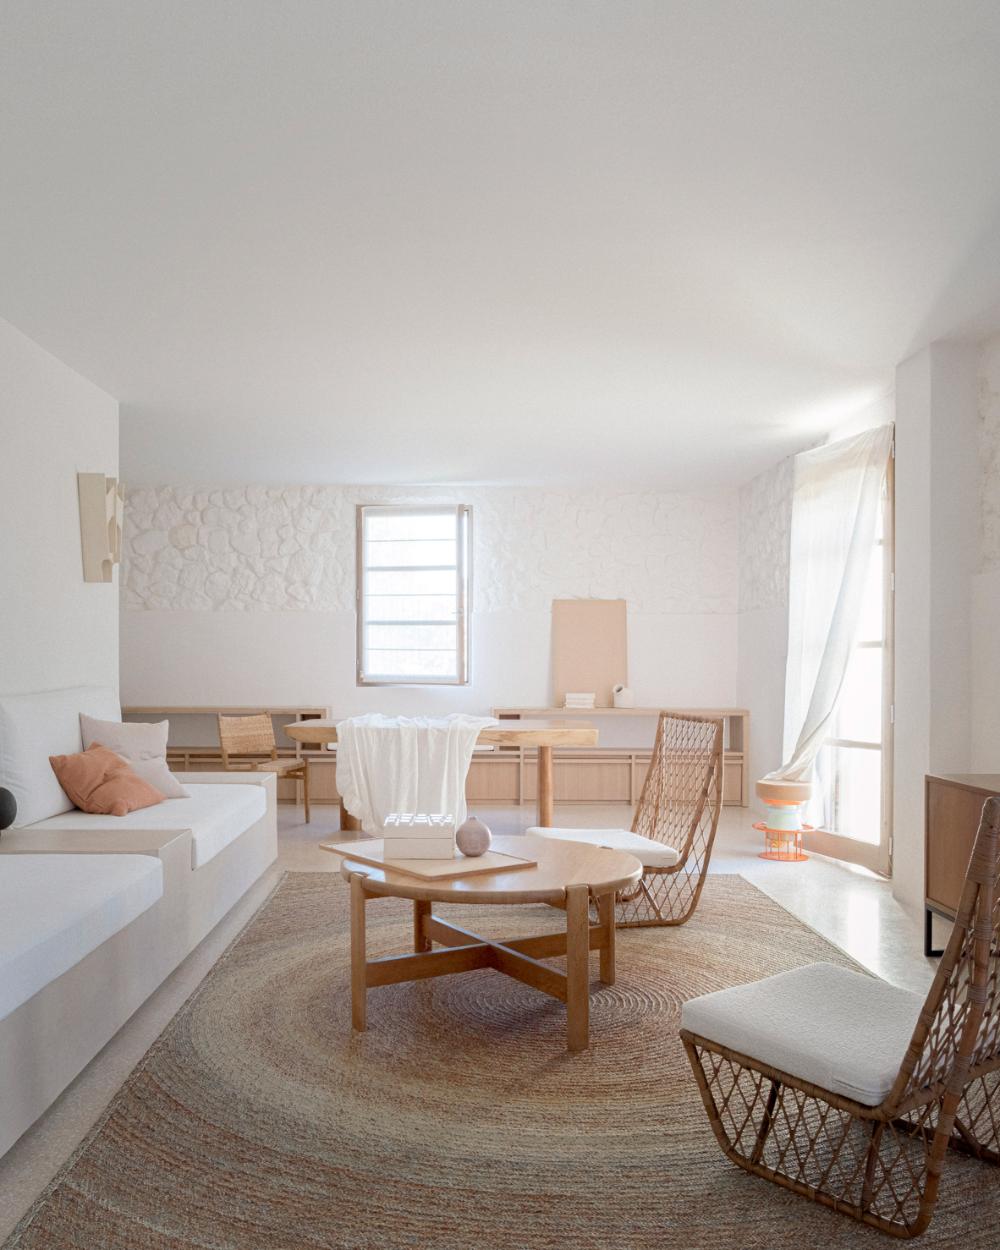 Timothee Mercier Transforms Rural French Farm Building Into Ma House In 2020 Farm Buildings Interior House Interior [ 1250 x 1000 Pixel ]